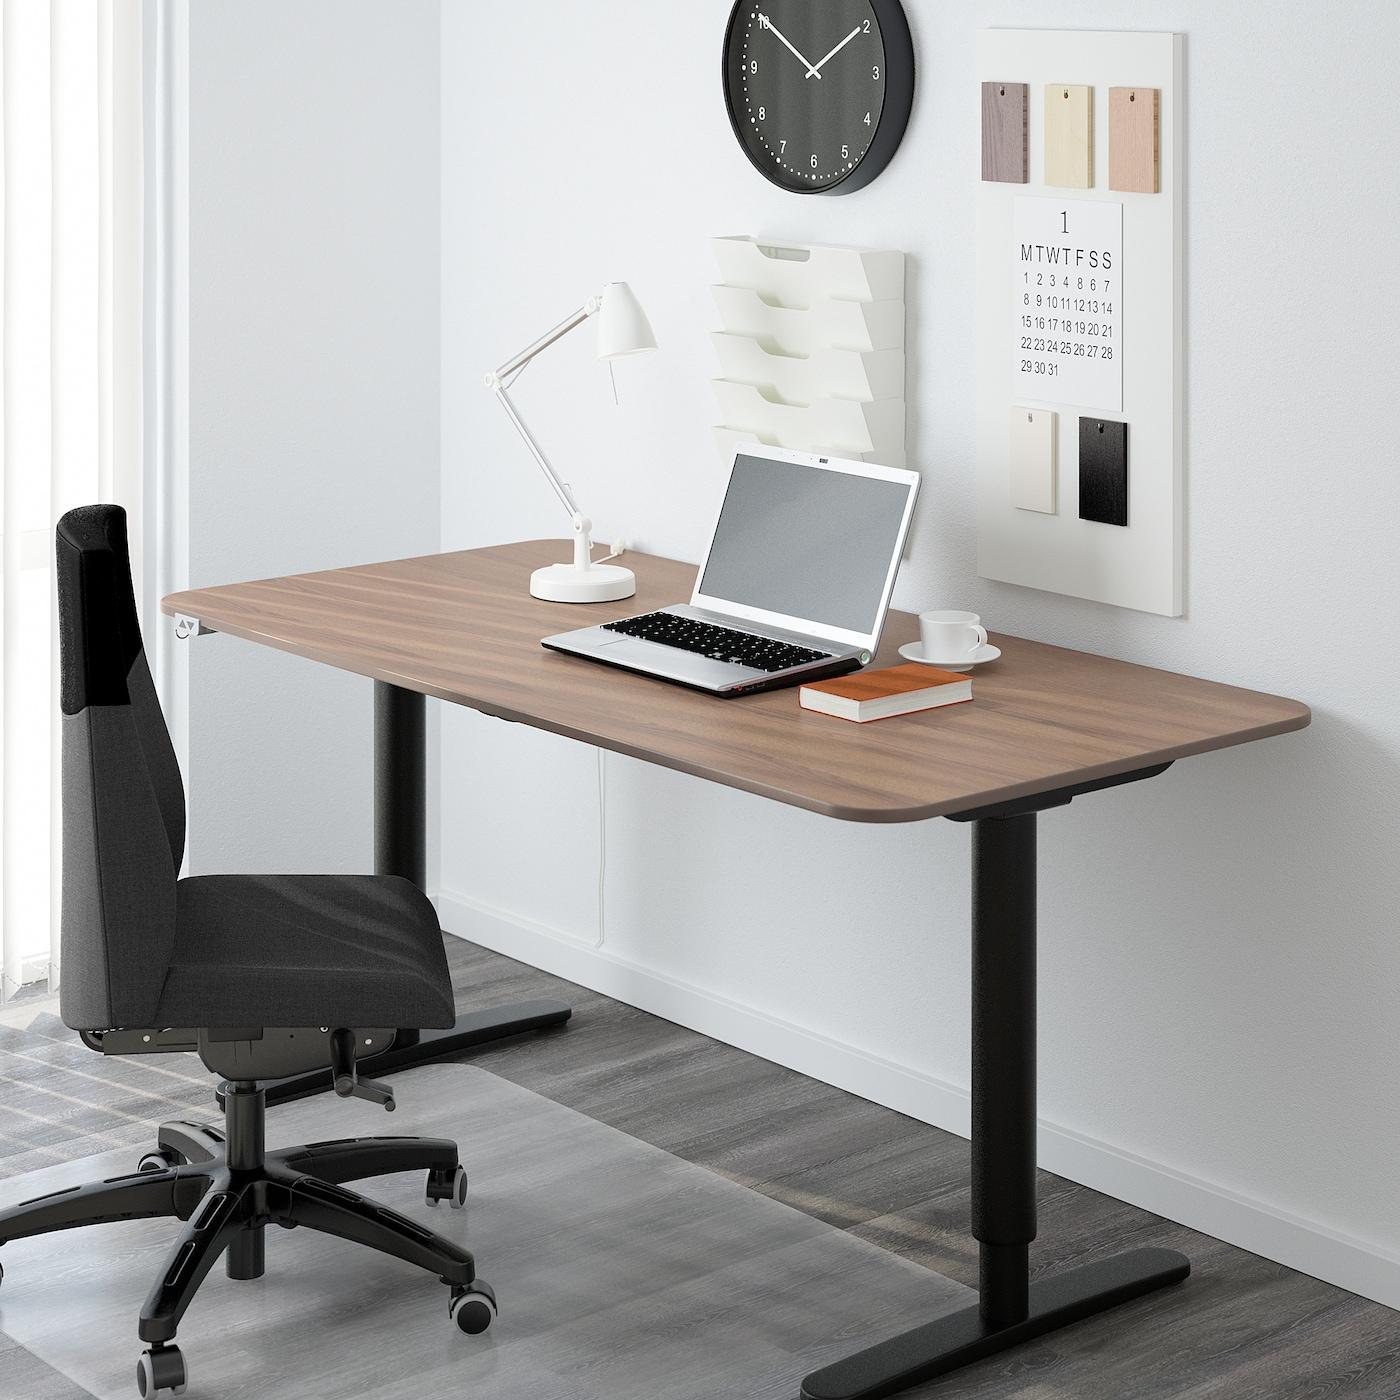 BEKANT Underframe sit/stand f table tp, el - black 38x38 cm